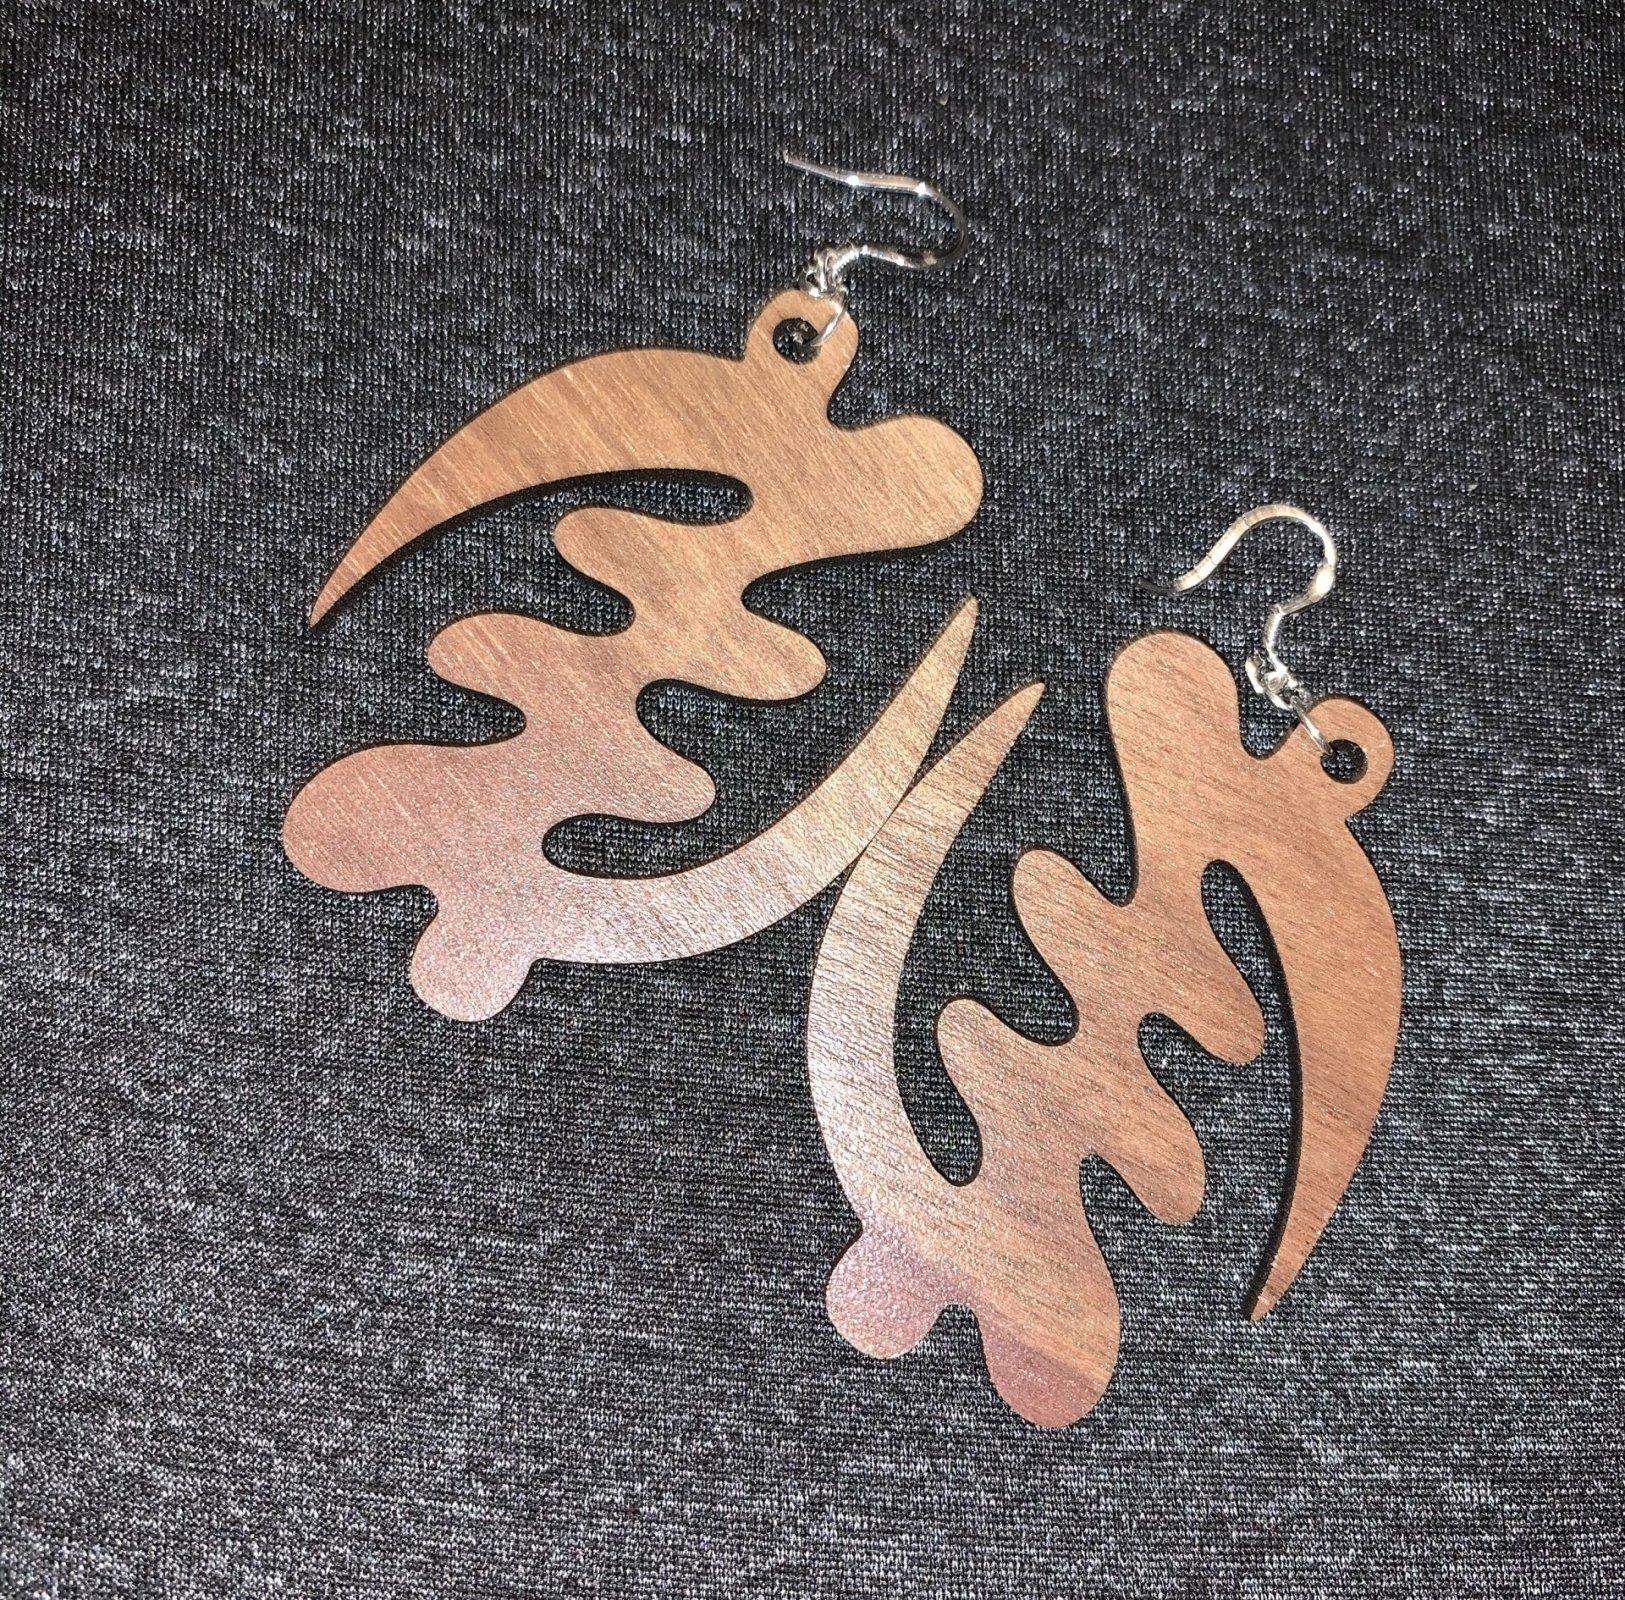 Adinkra African Symbol Earrings - Supremacy of God